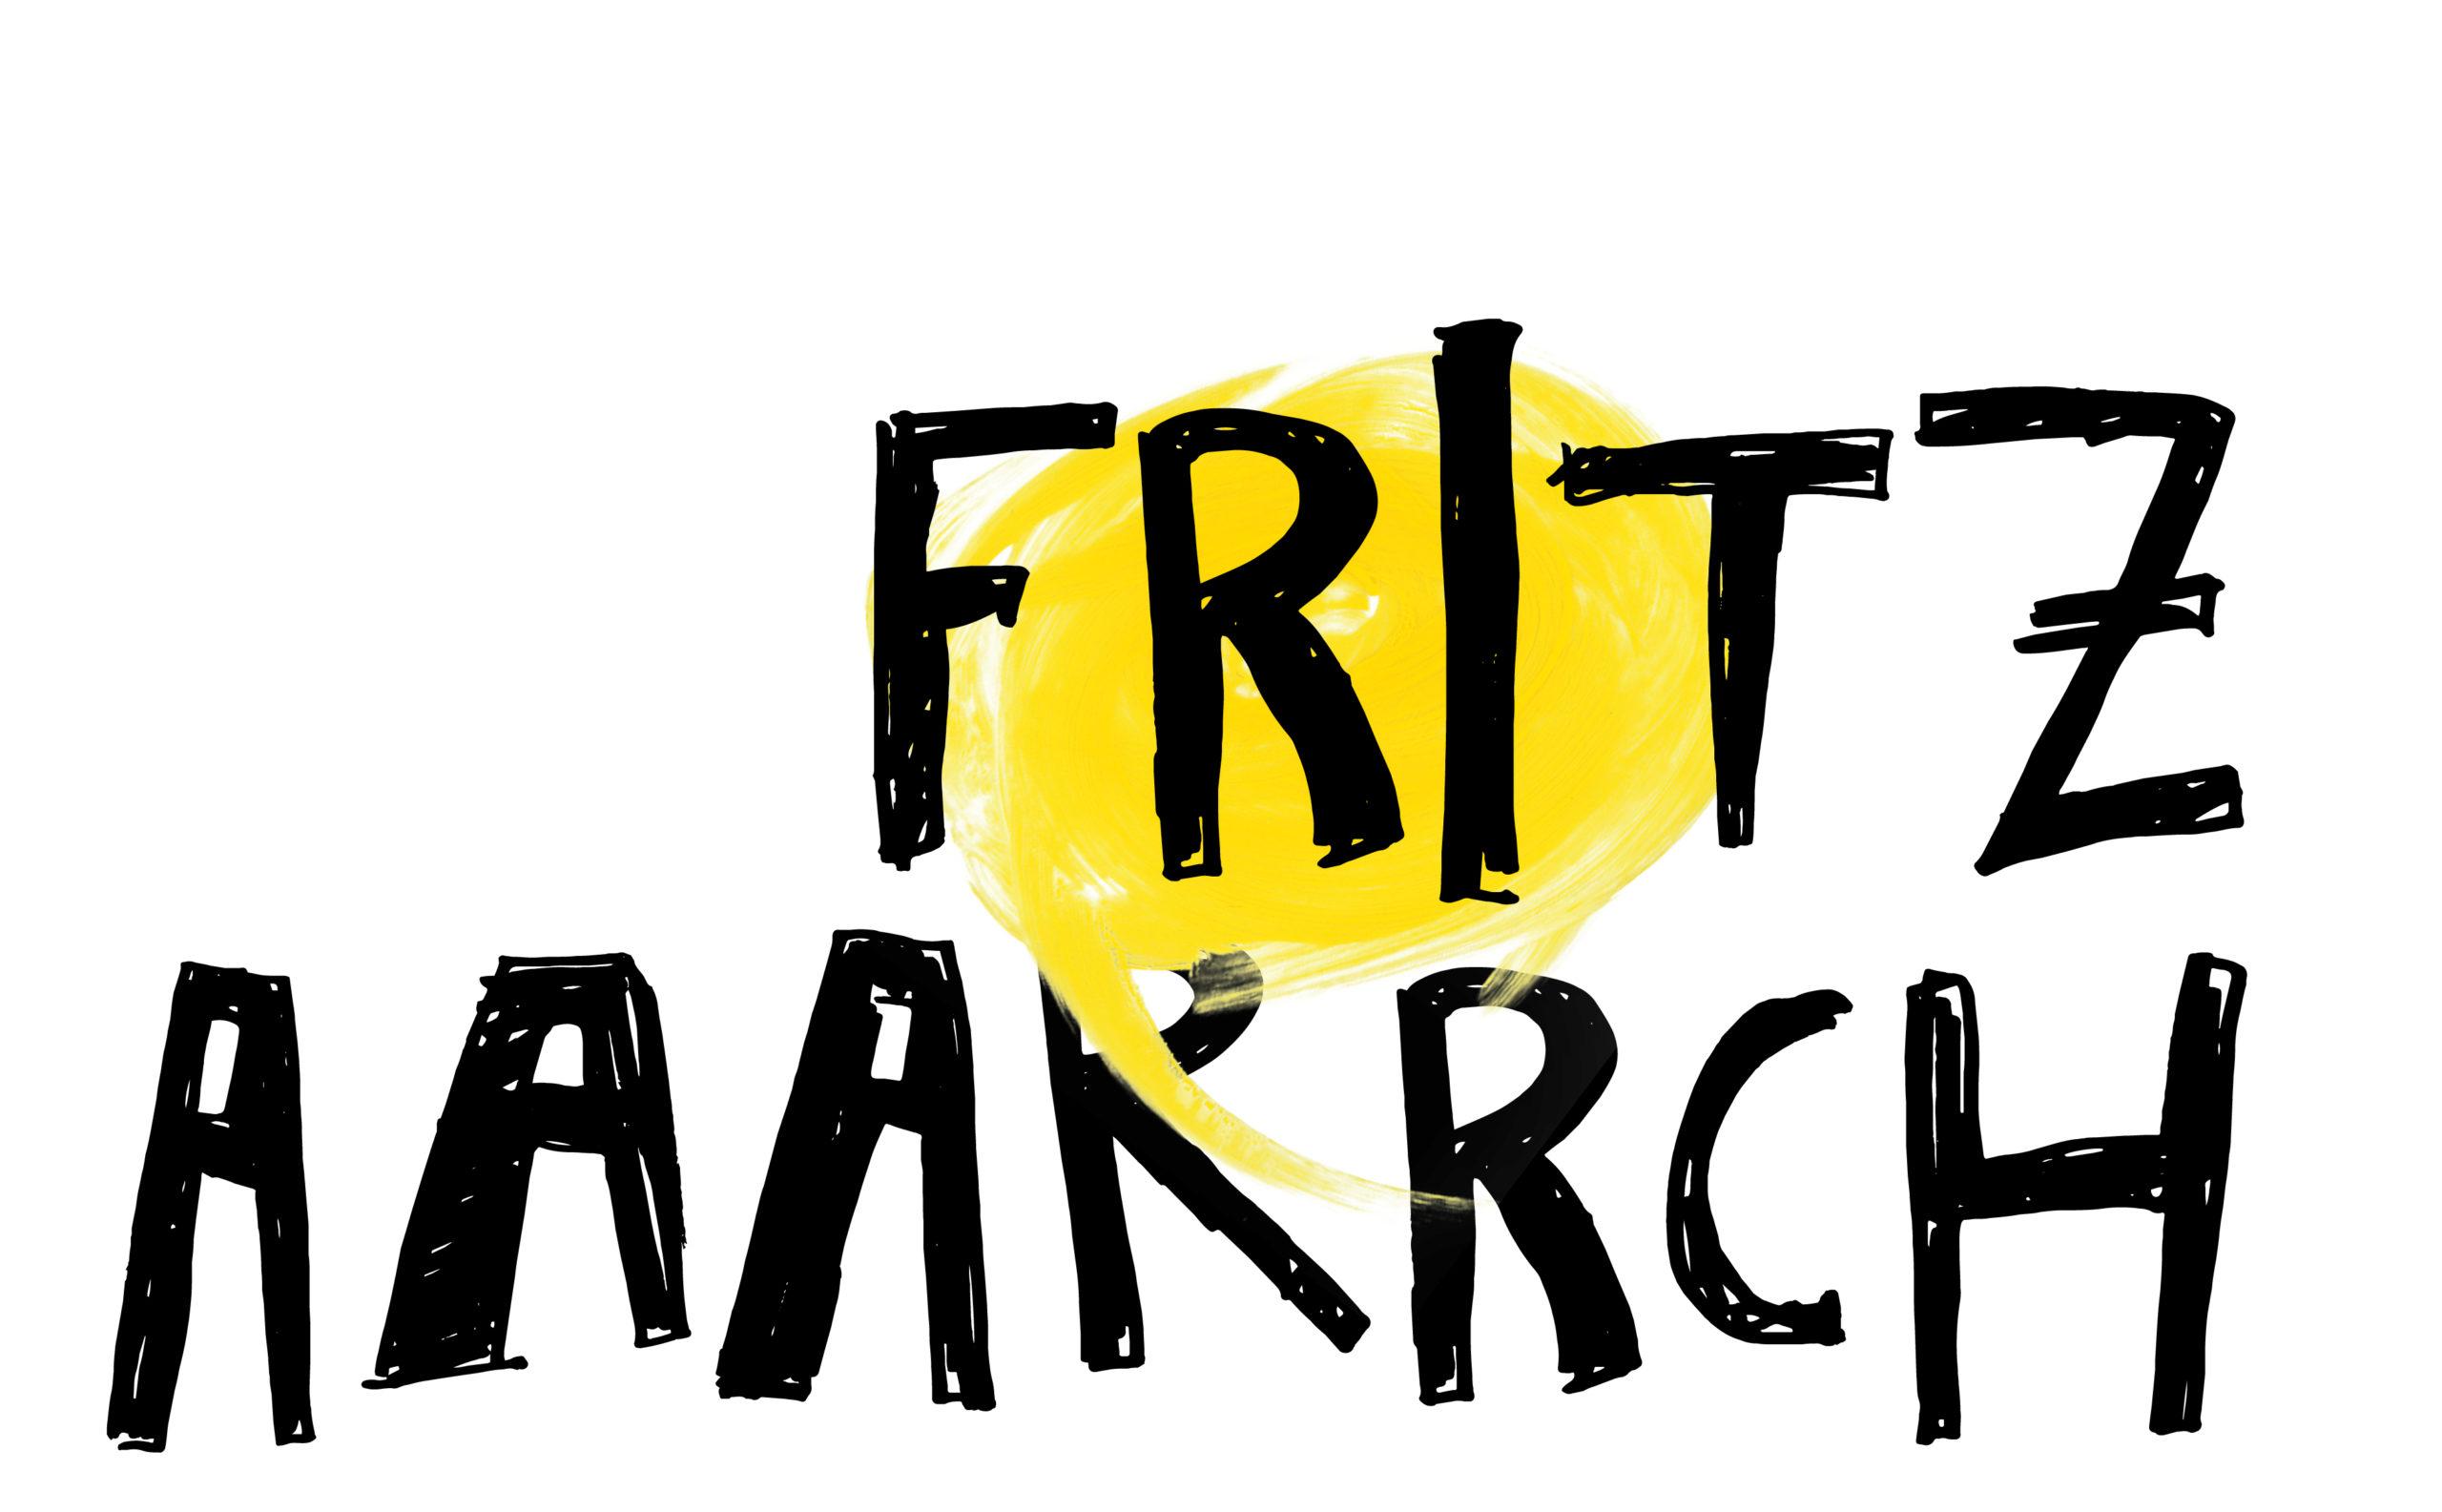 FritzTypo